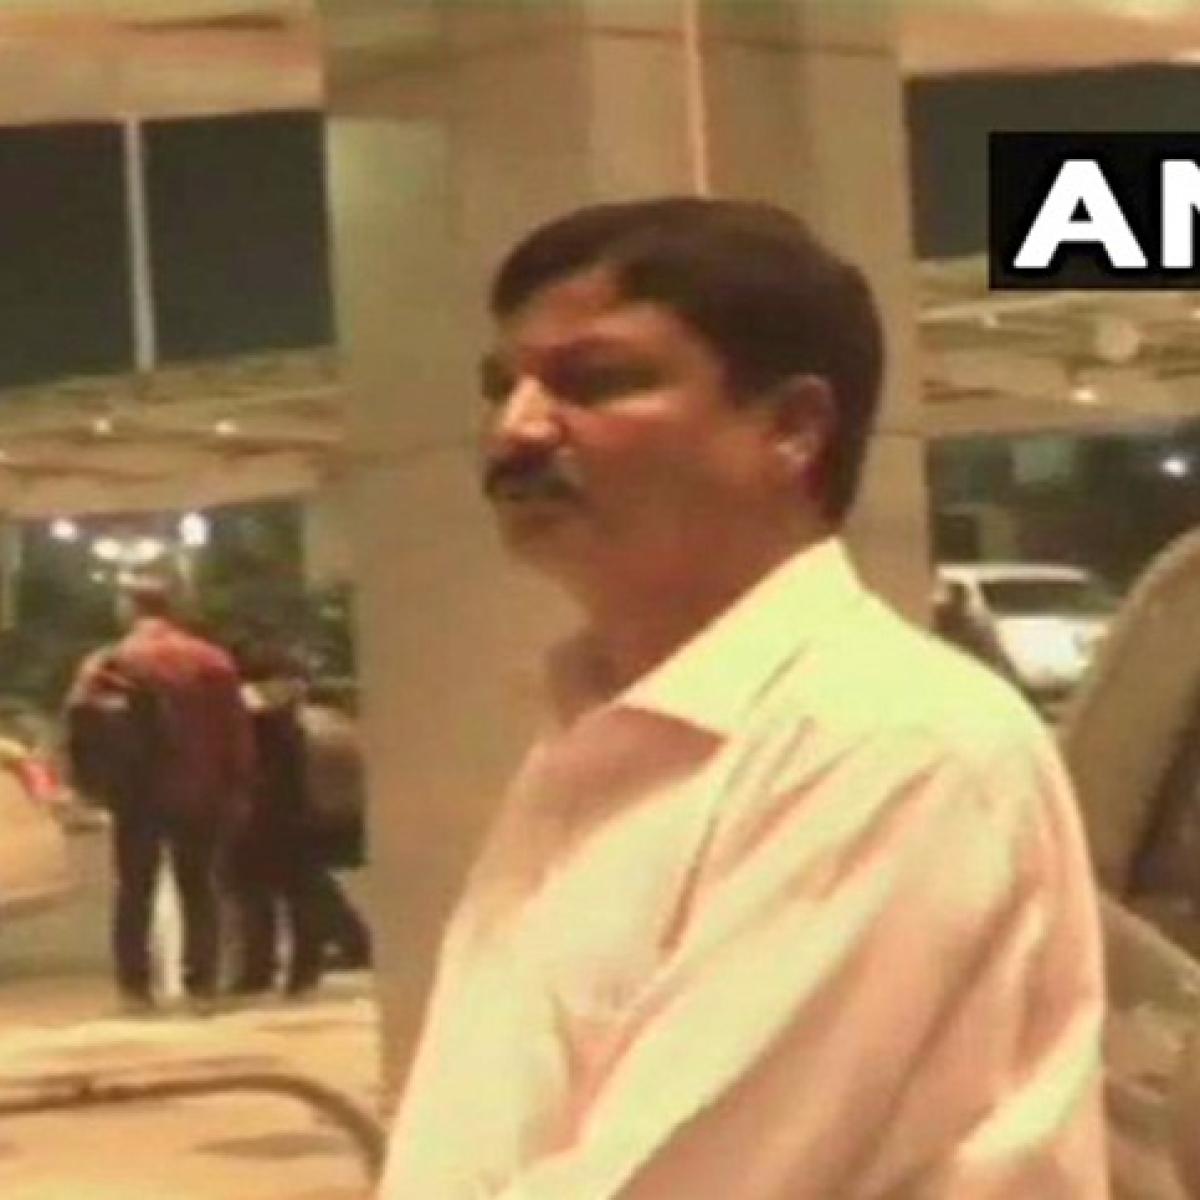 Karnataka sex scandal: Minister Ramesh Jarkiholi resigns on 'moral grounds', claims innocence